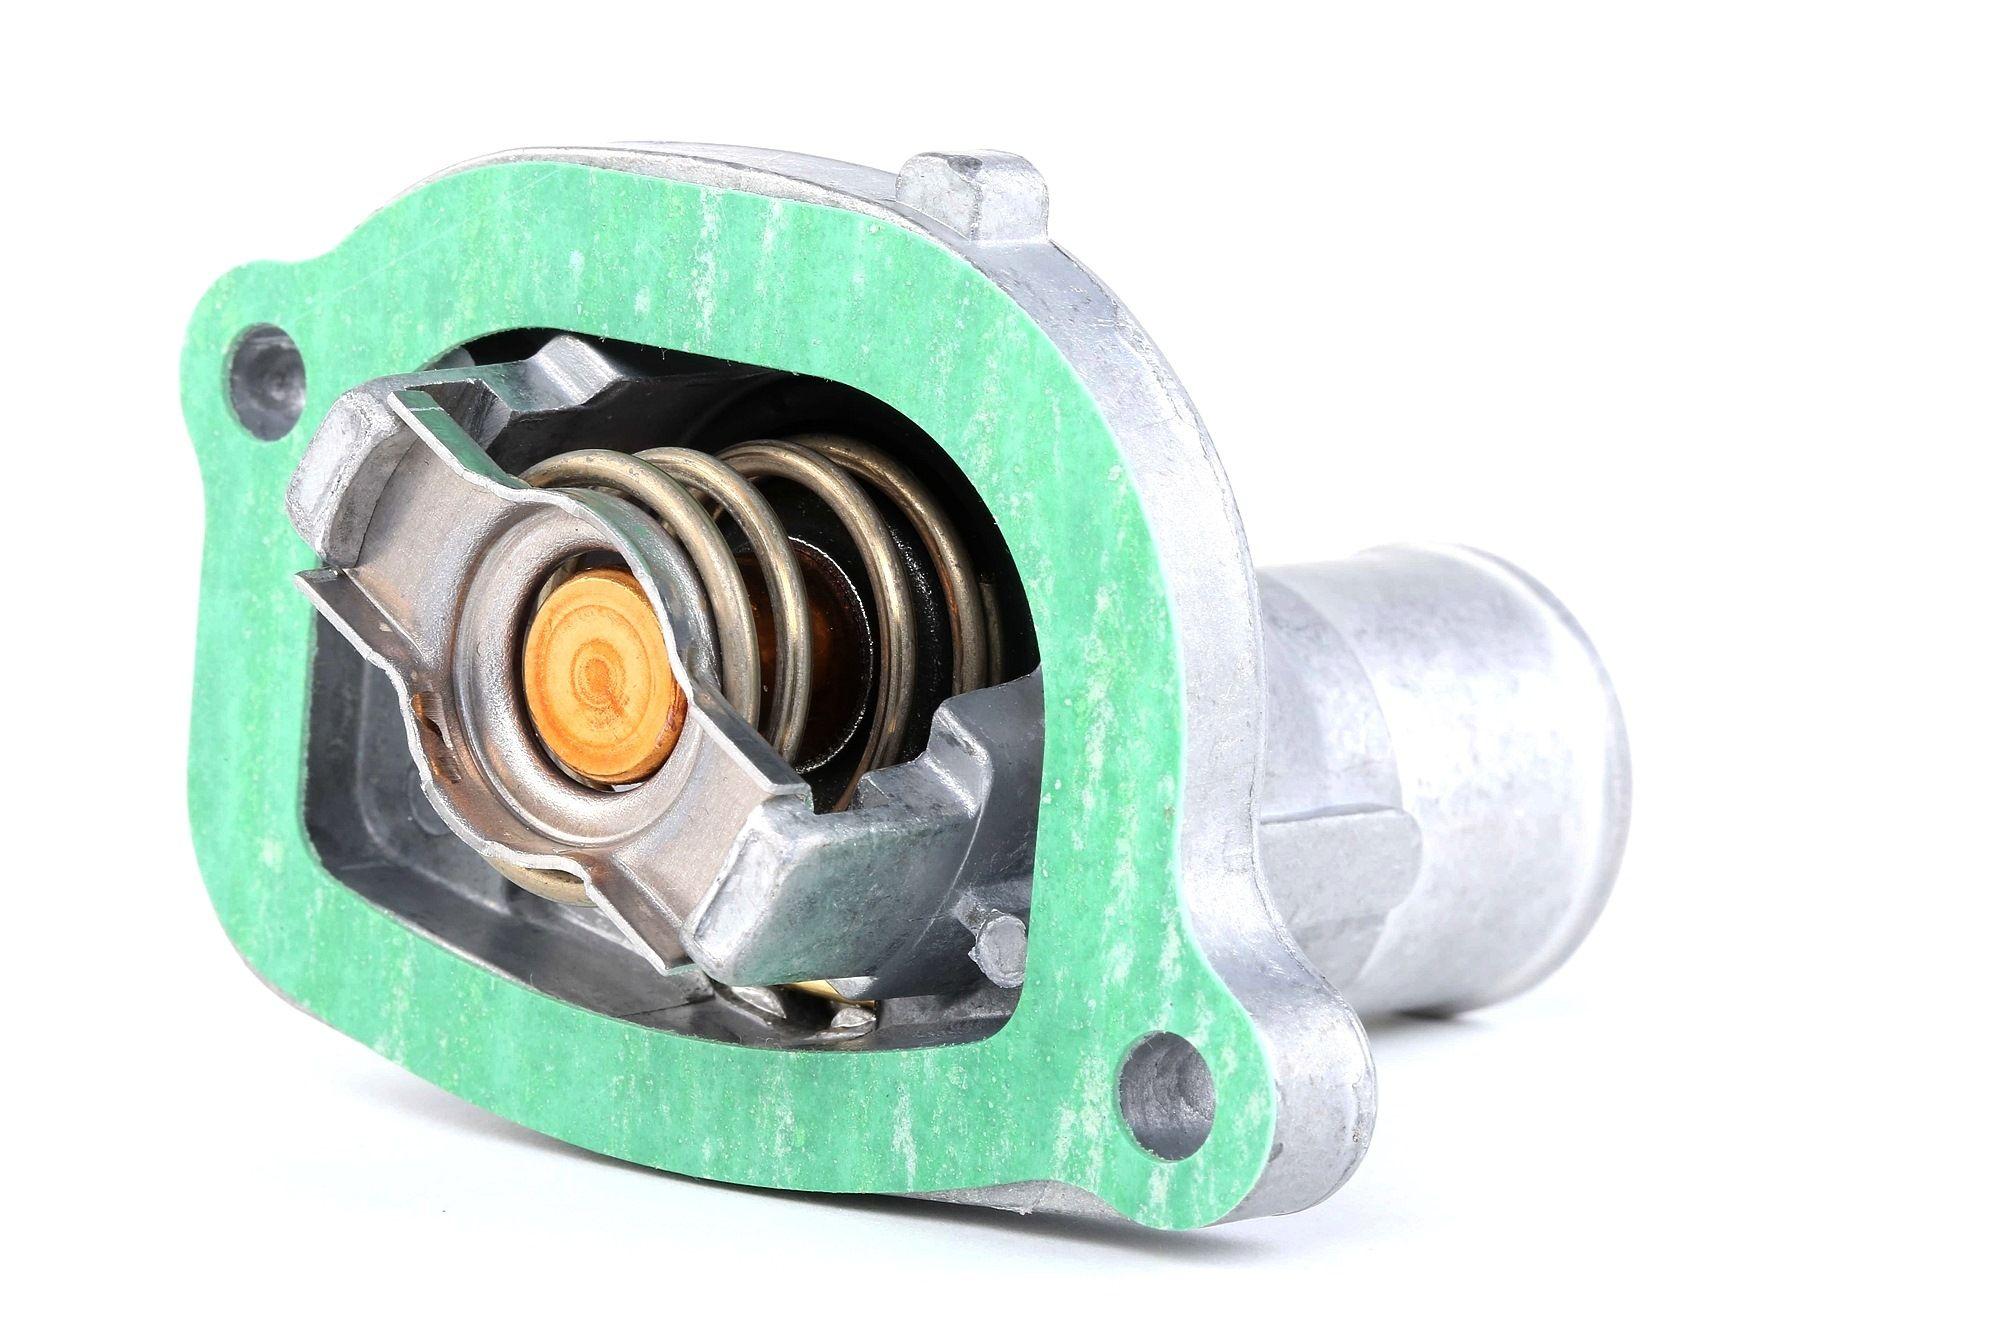 Originali Valvola termostatica TH5069.87J Carbodies